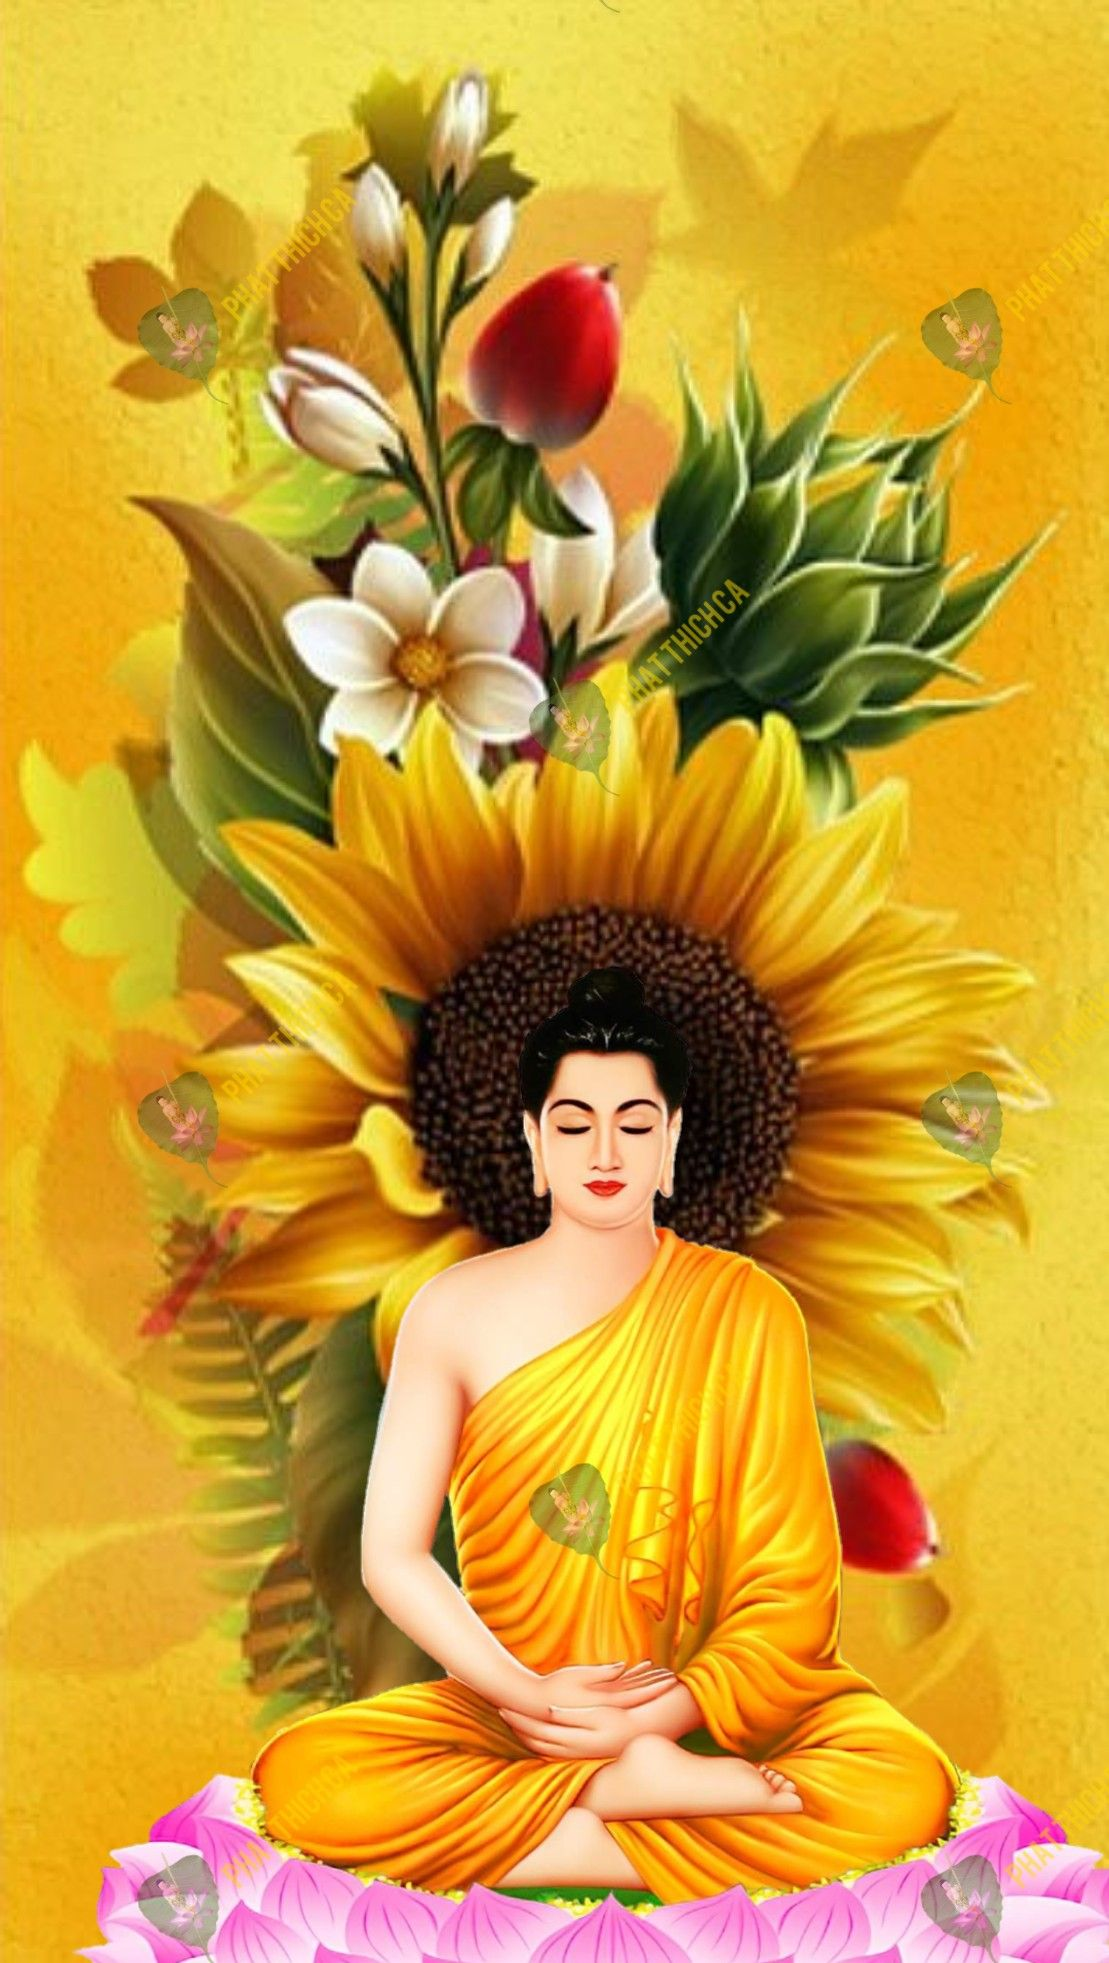 141 Best Lord Buddha Images In 2020 Buddha Buddhism Buddha Image